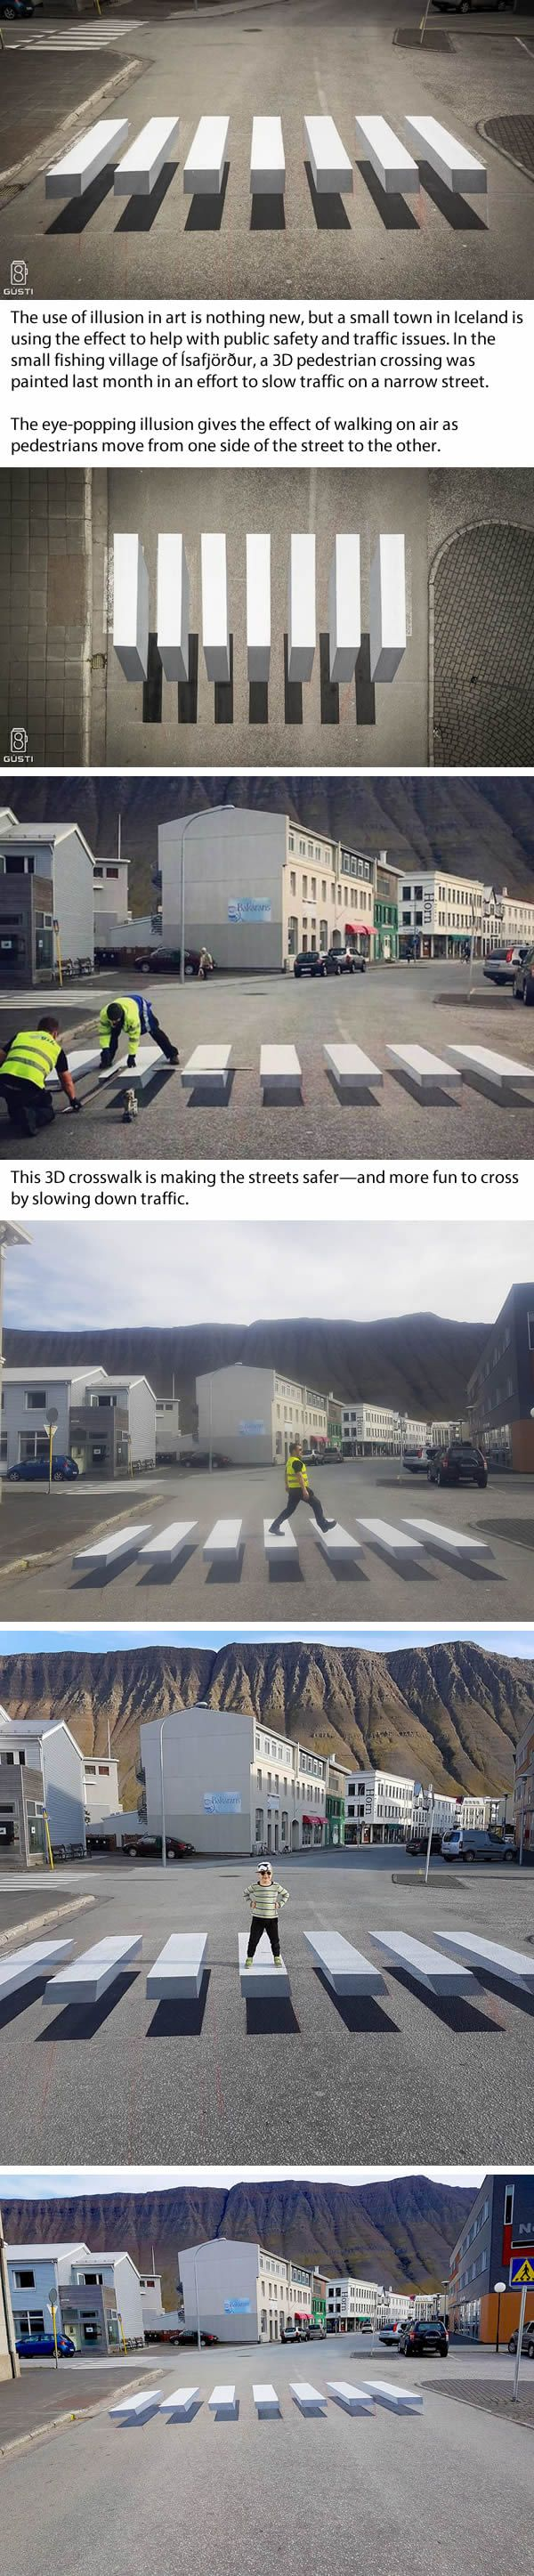 Iceland Has 3D Zebra Stripe Crosswalk with Stunning Optical Illusion